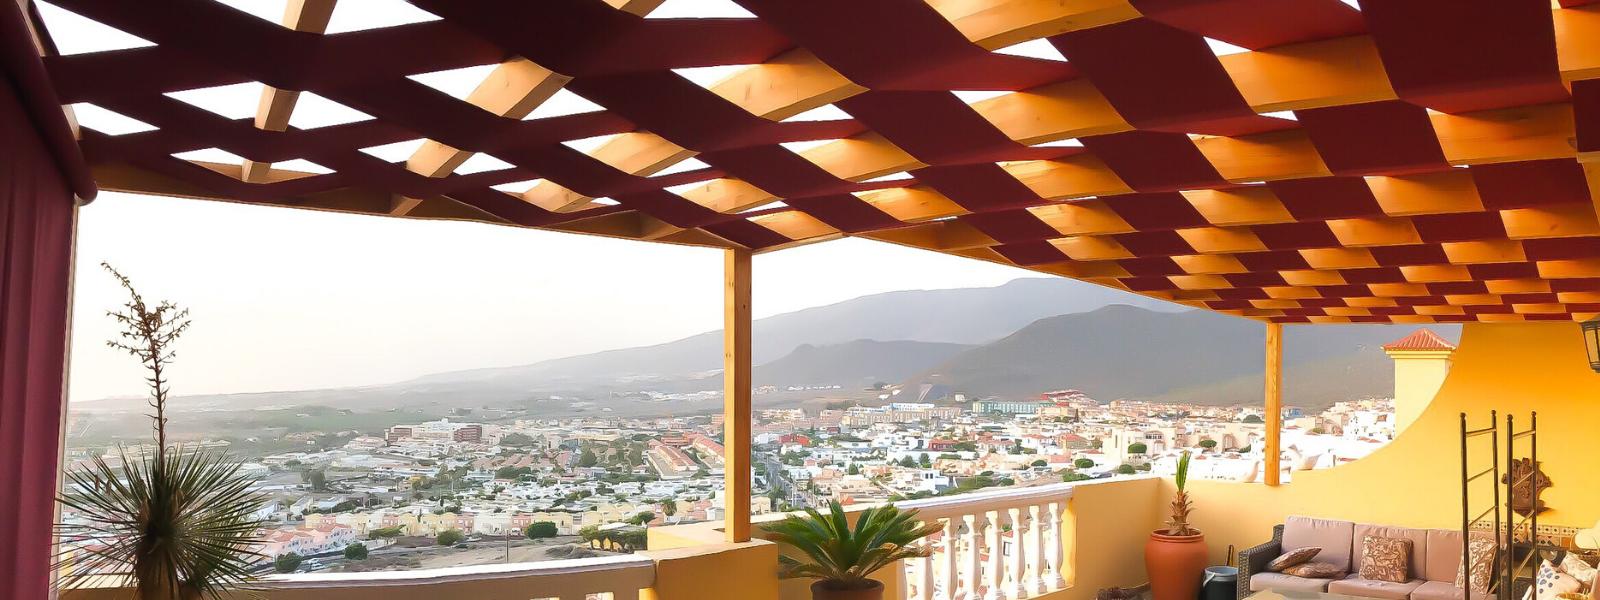 Wooden Terrace with Interlacing Fabric, Costa Adeje, Tenerife